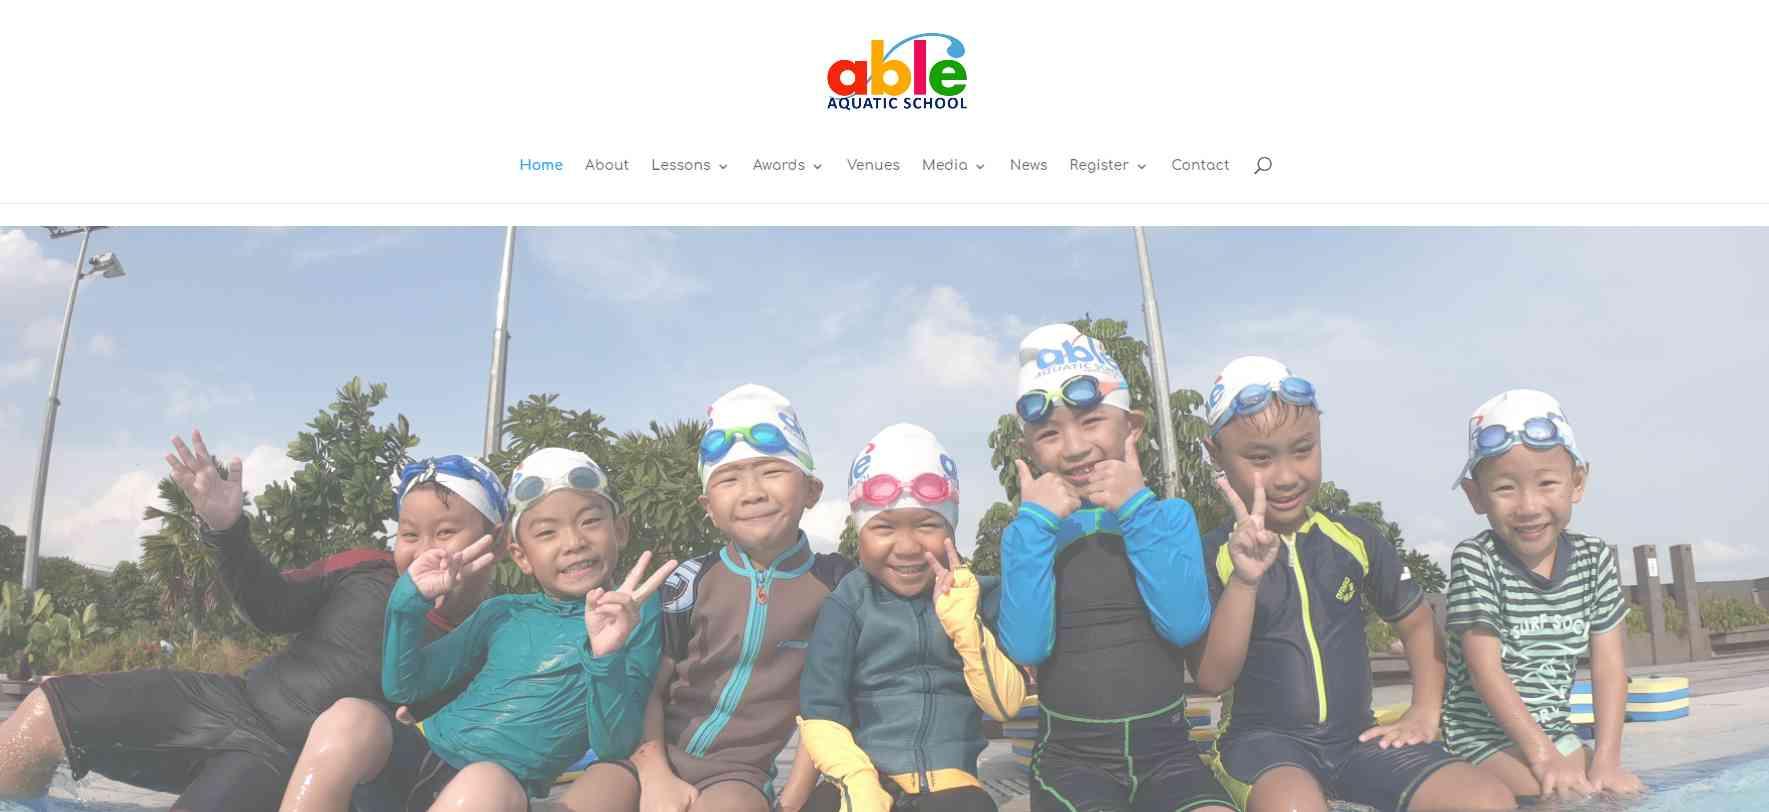 Able Aquatic School Top Swimming Schools in Singapore